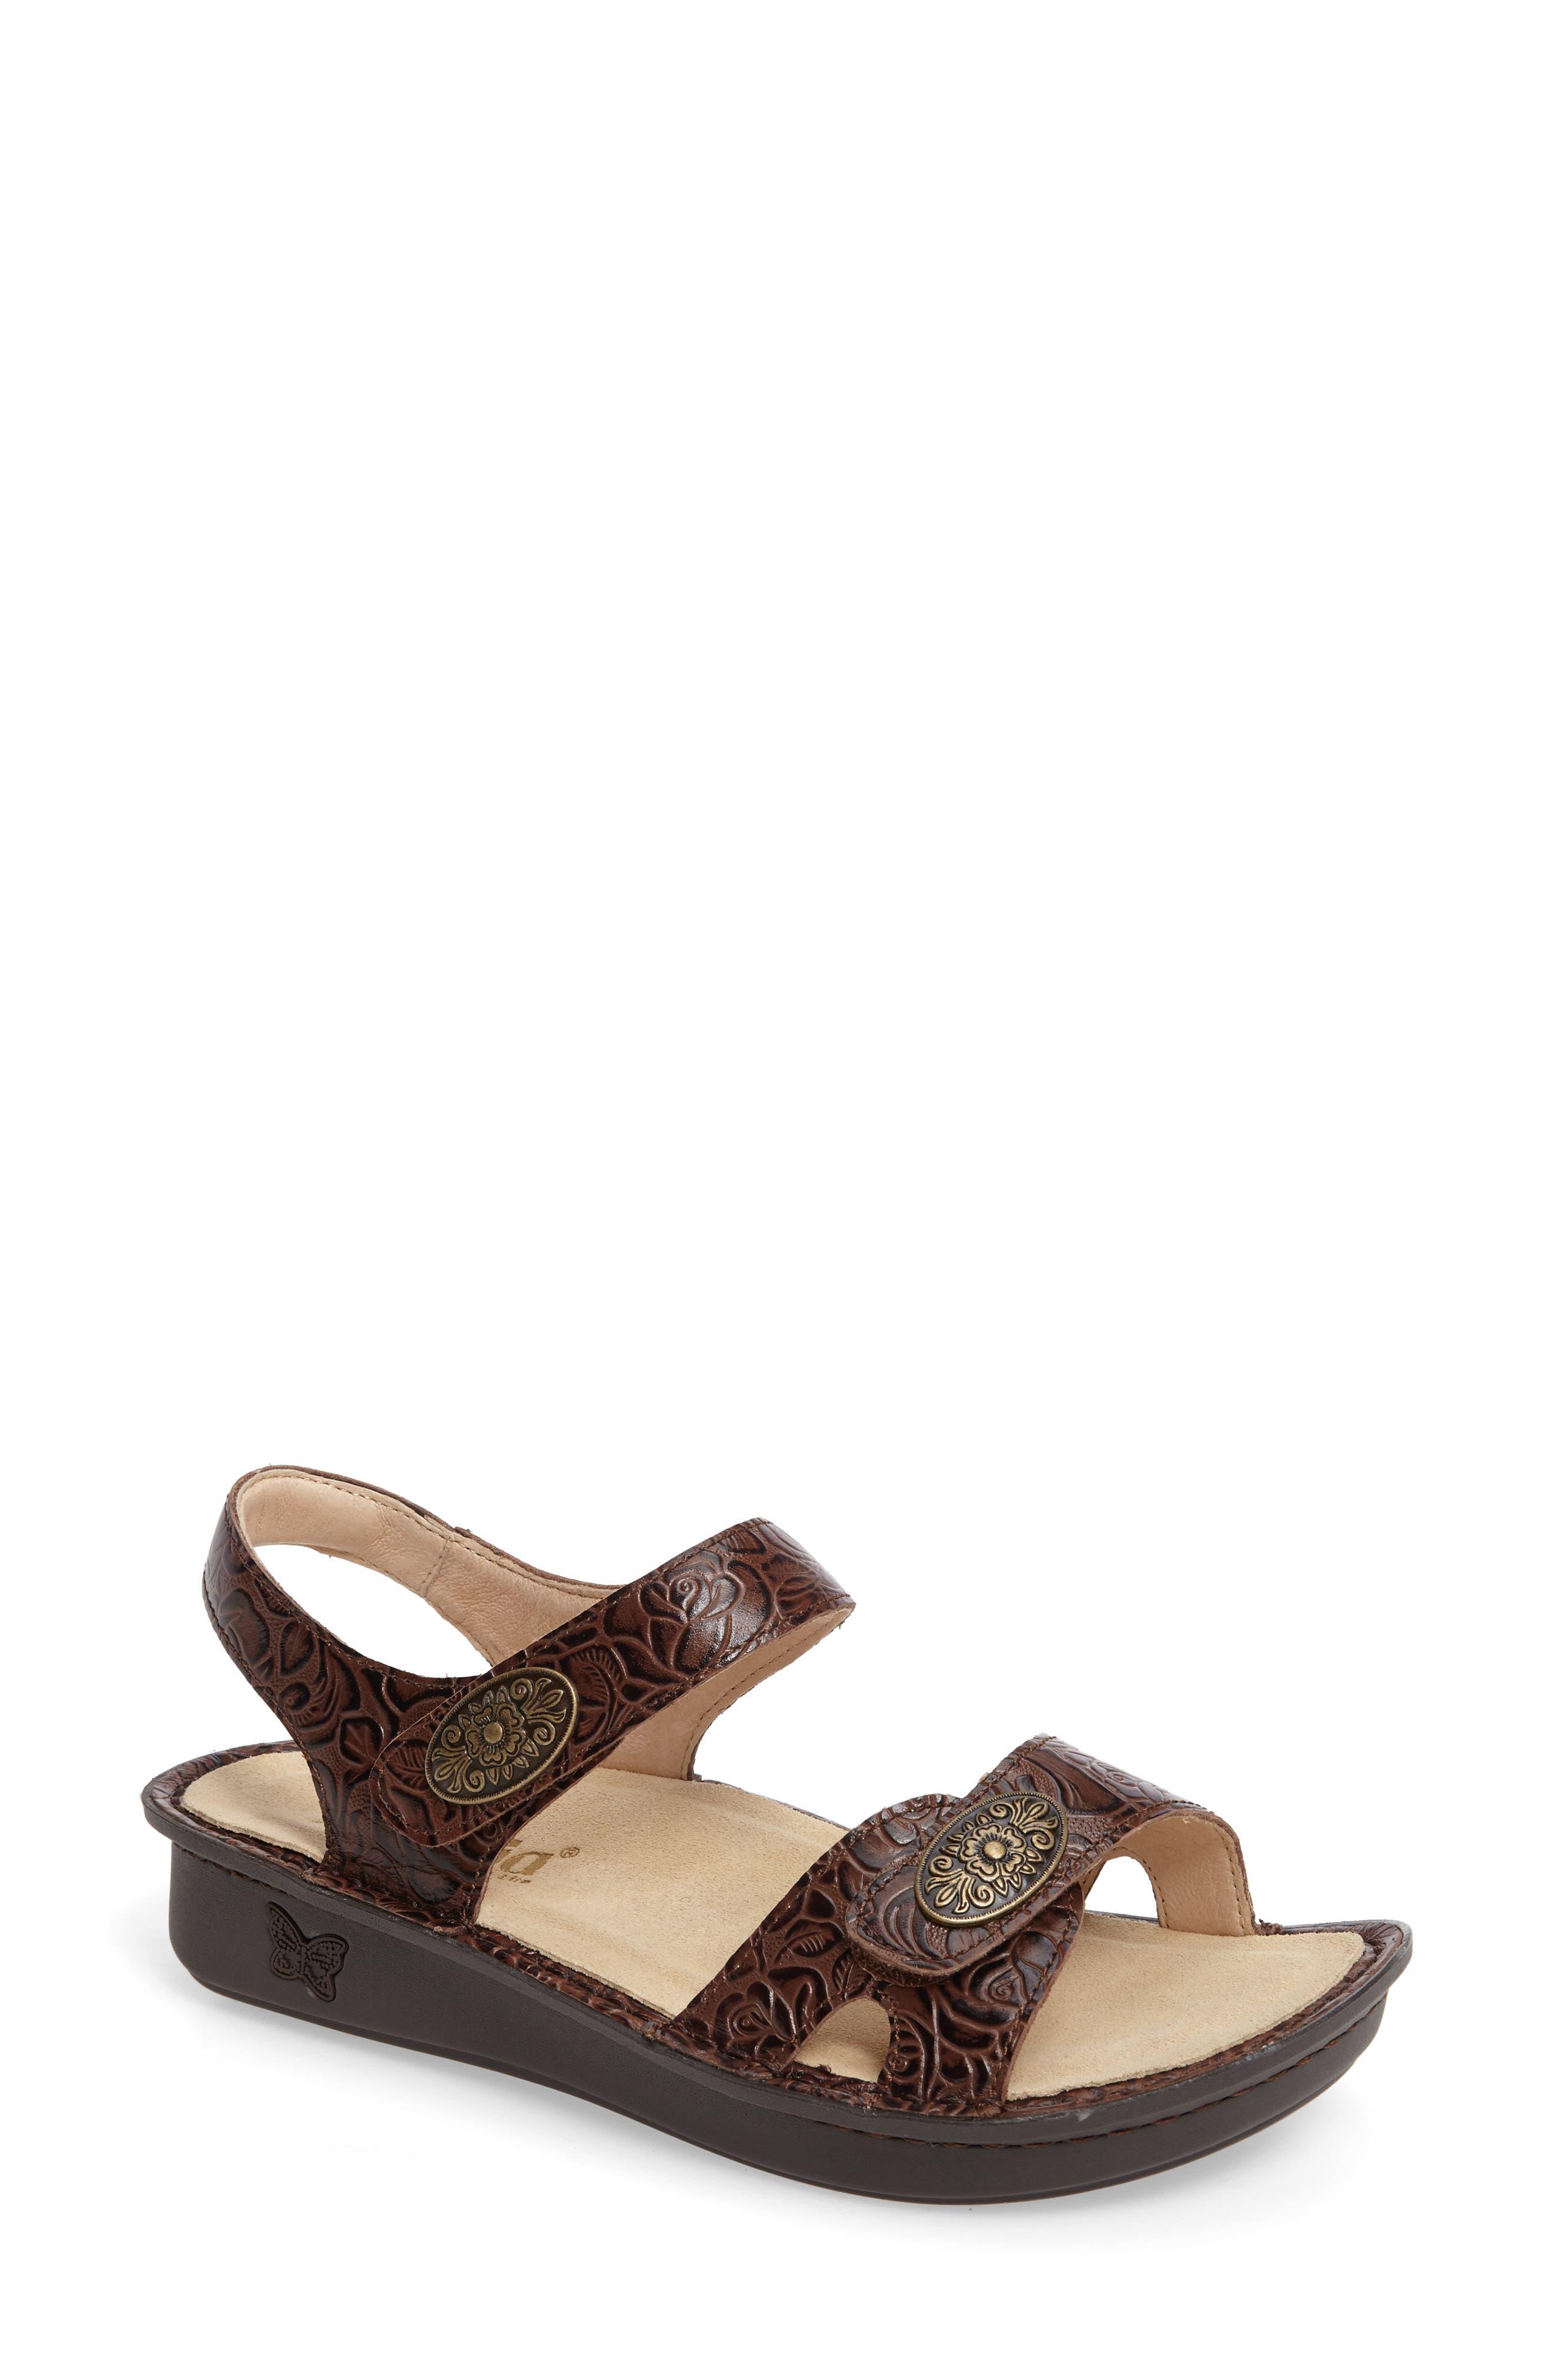 Alternate Image 1 Selected - Alegria Vienna Sandal (Women)